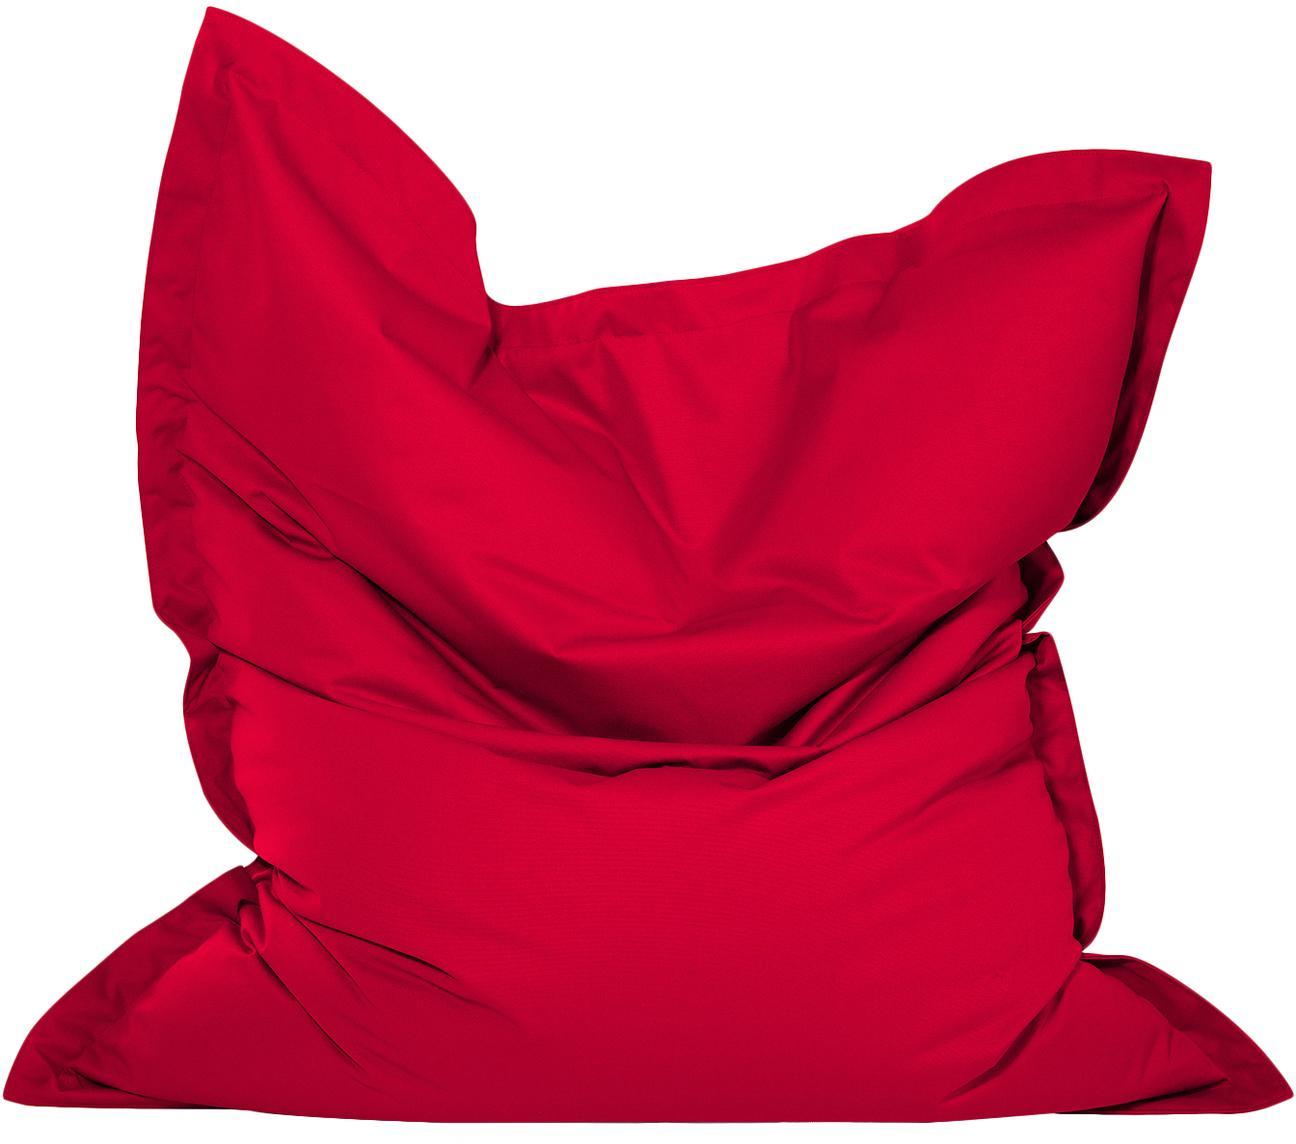 Grote zitzak Meadow, Bekleding: polyester, polyurethaan g, Rood, 130 x 160 cm